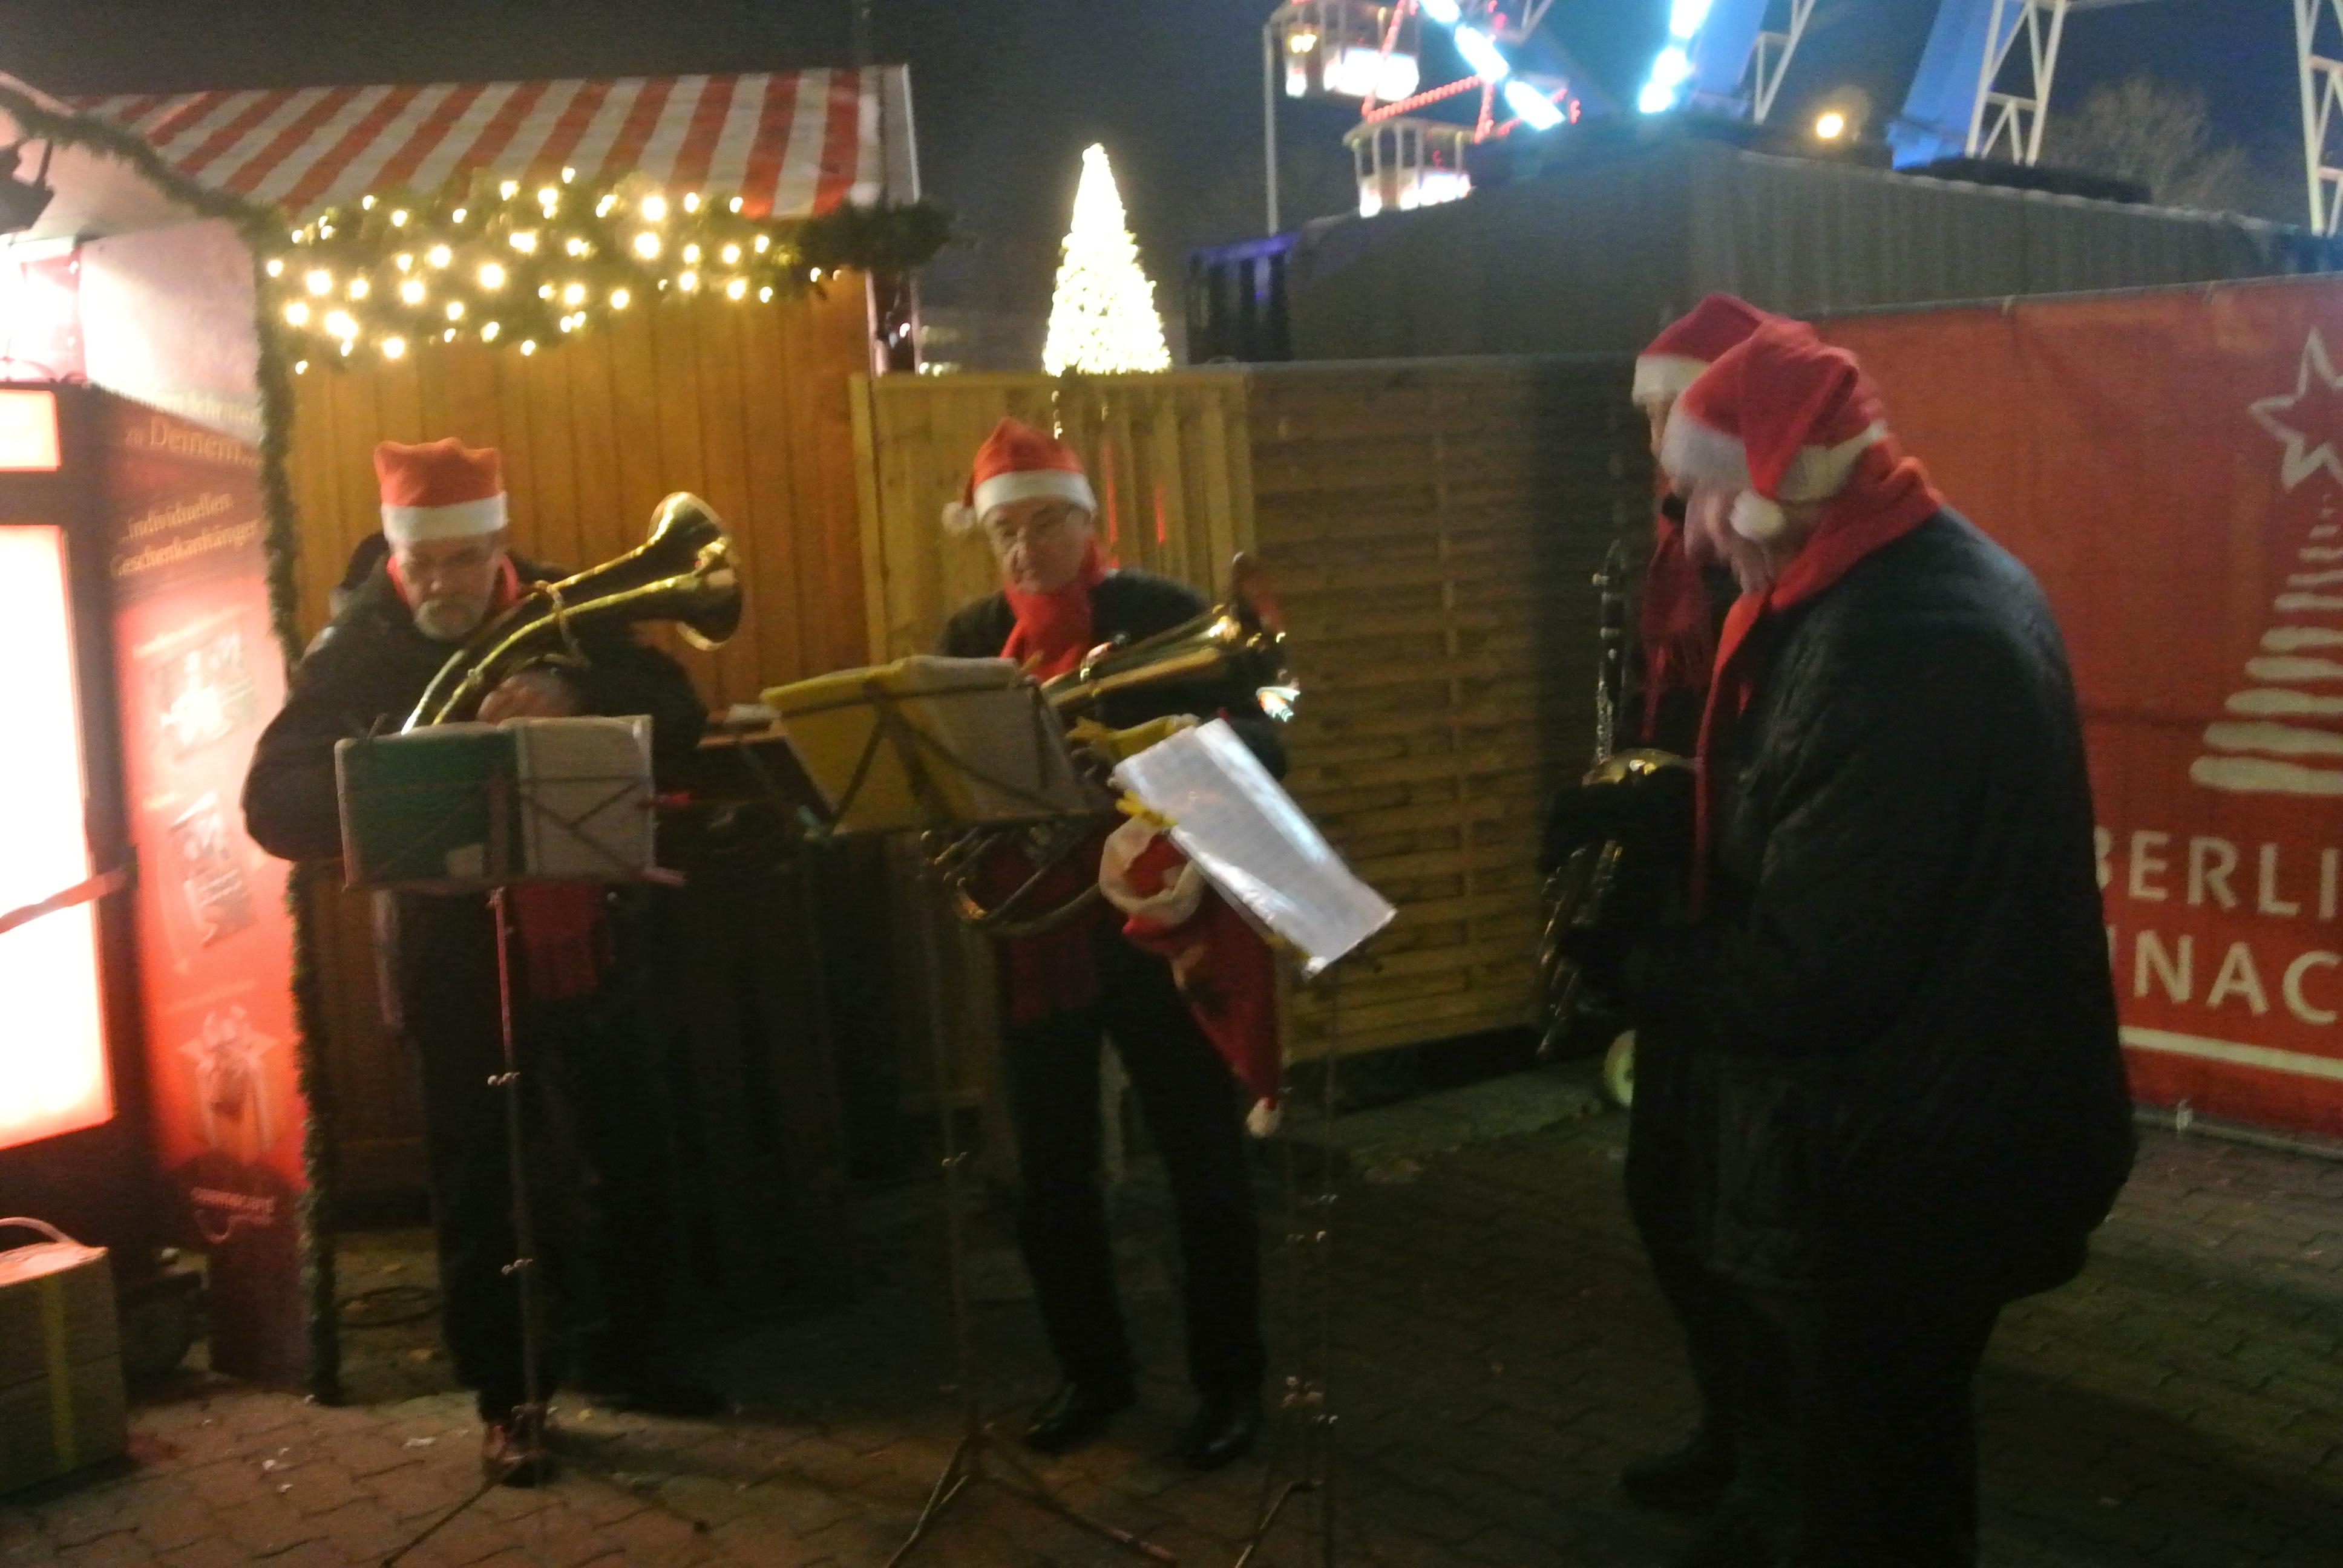 German Band at Christmas Market - photo by Juliamaud